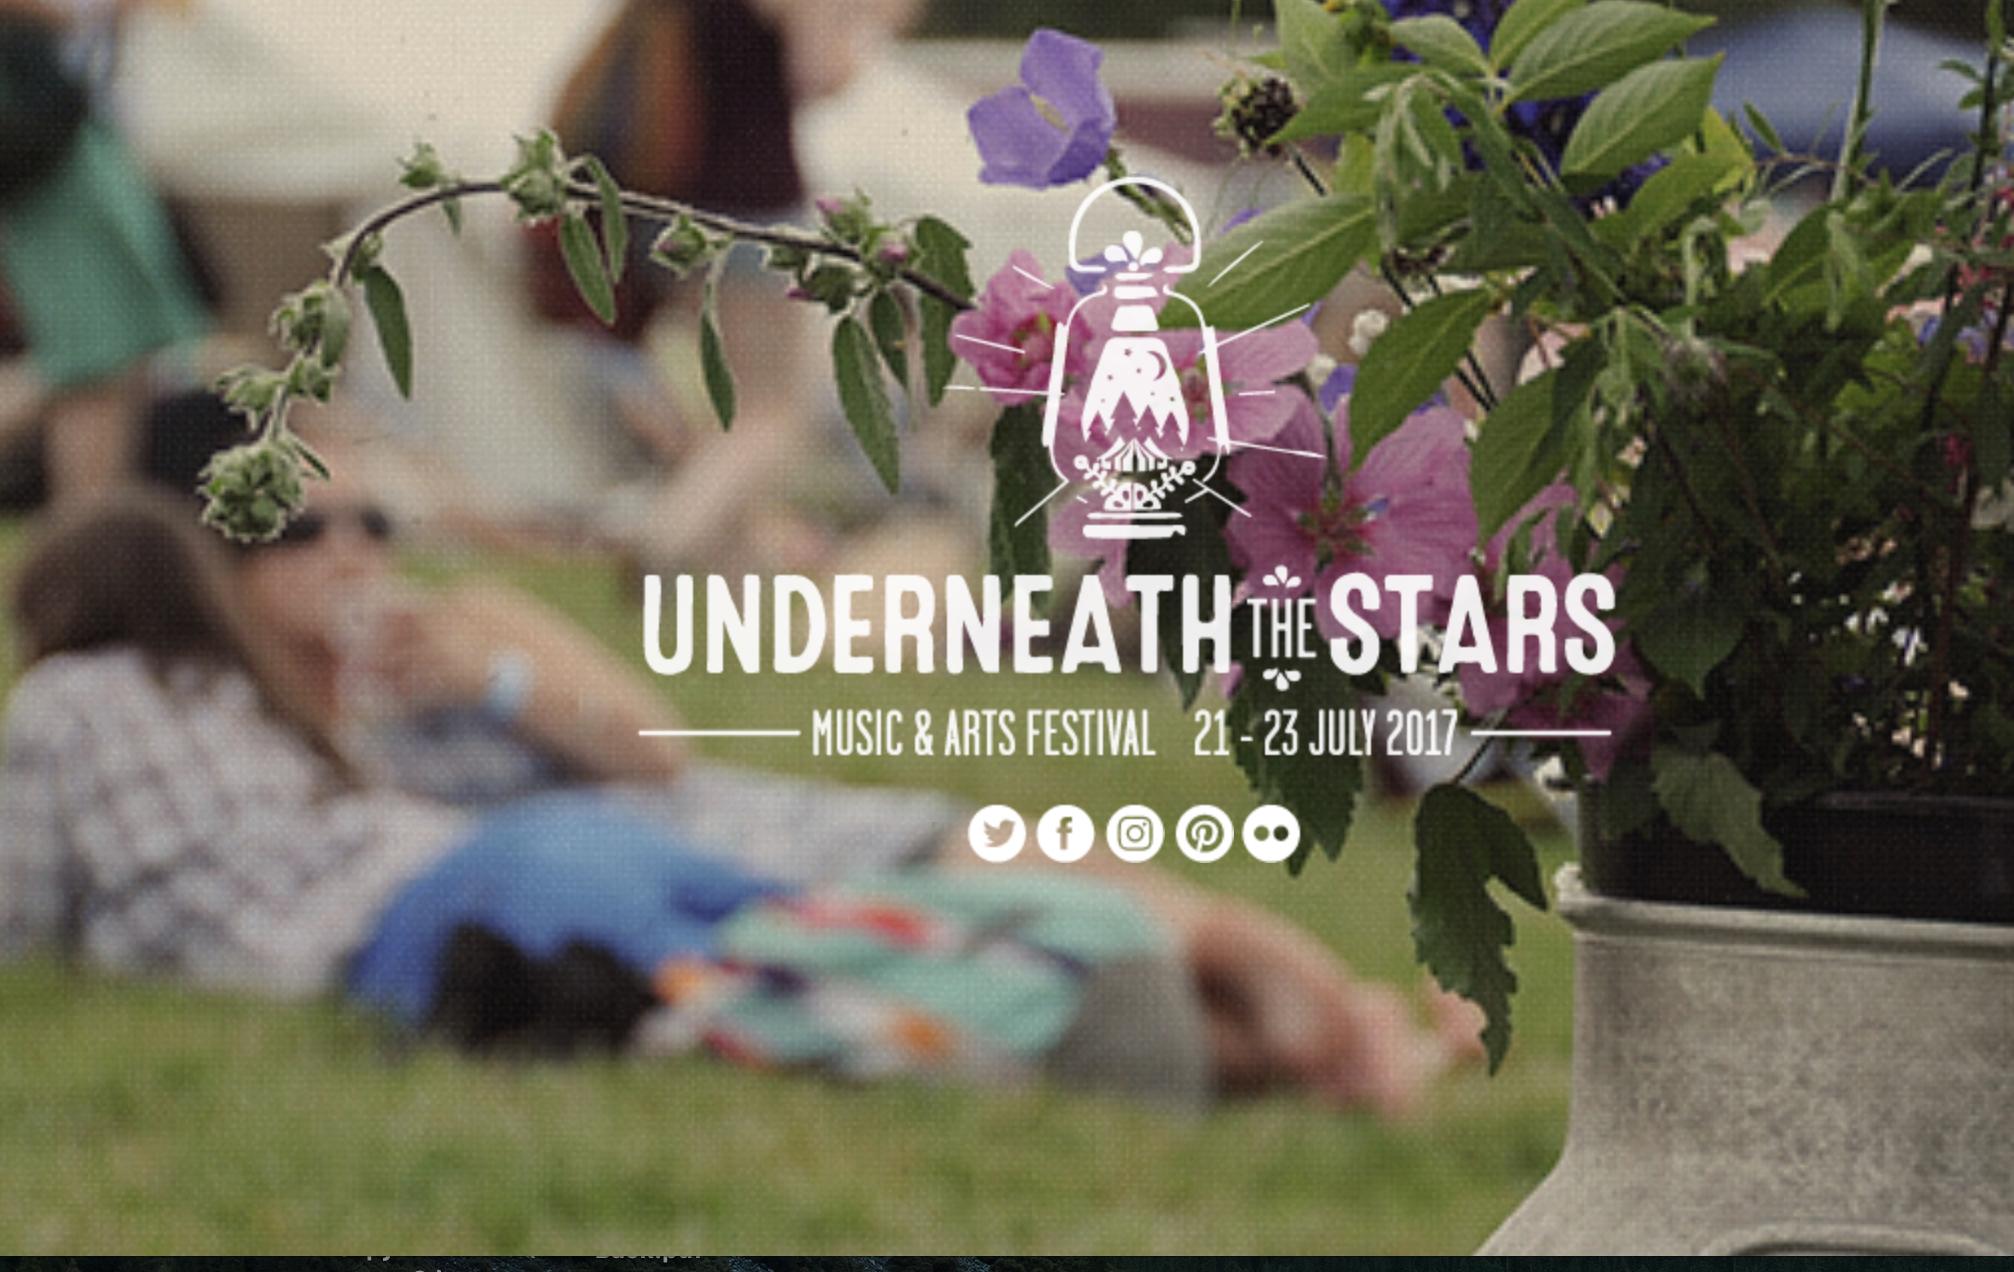 Underneath The Stars 2